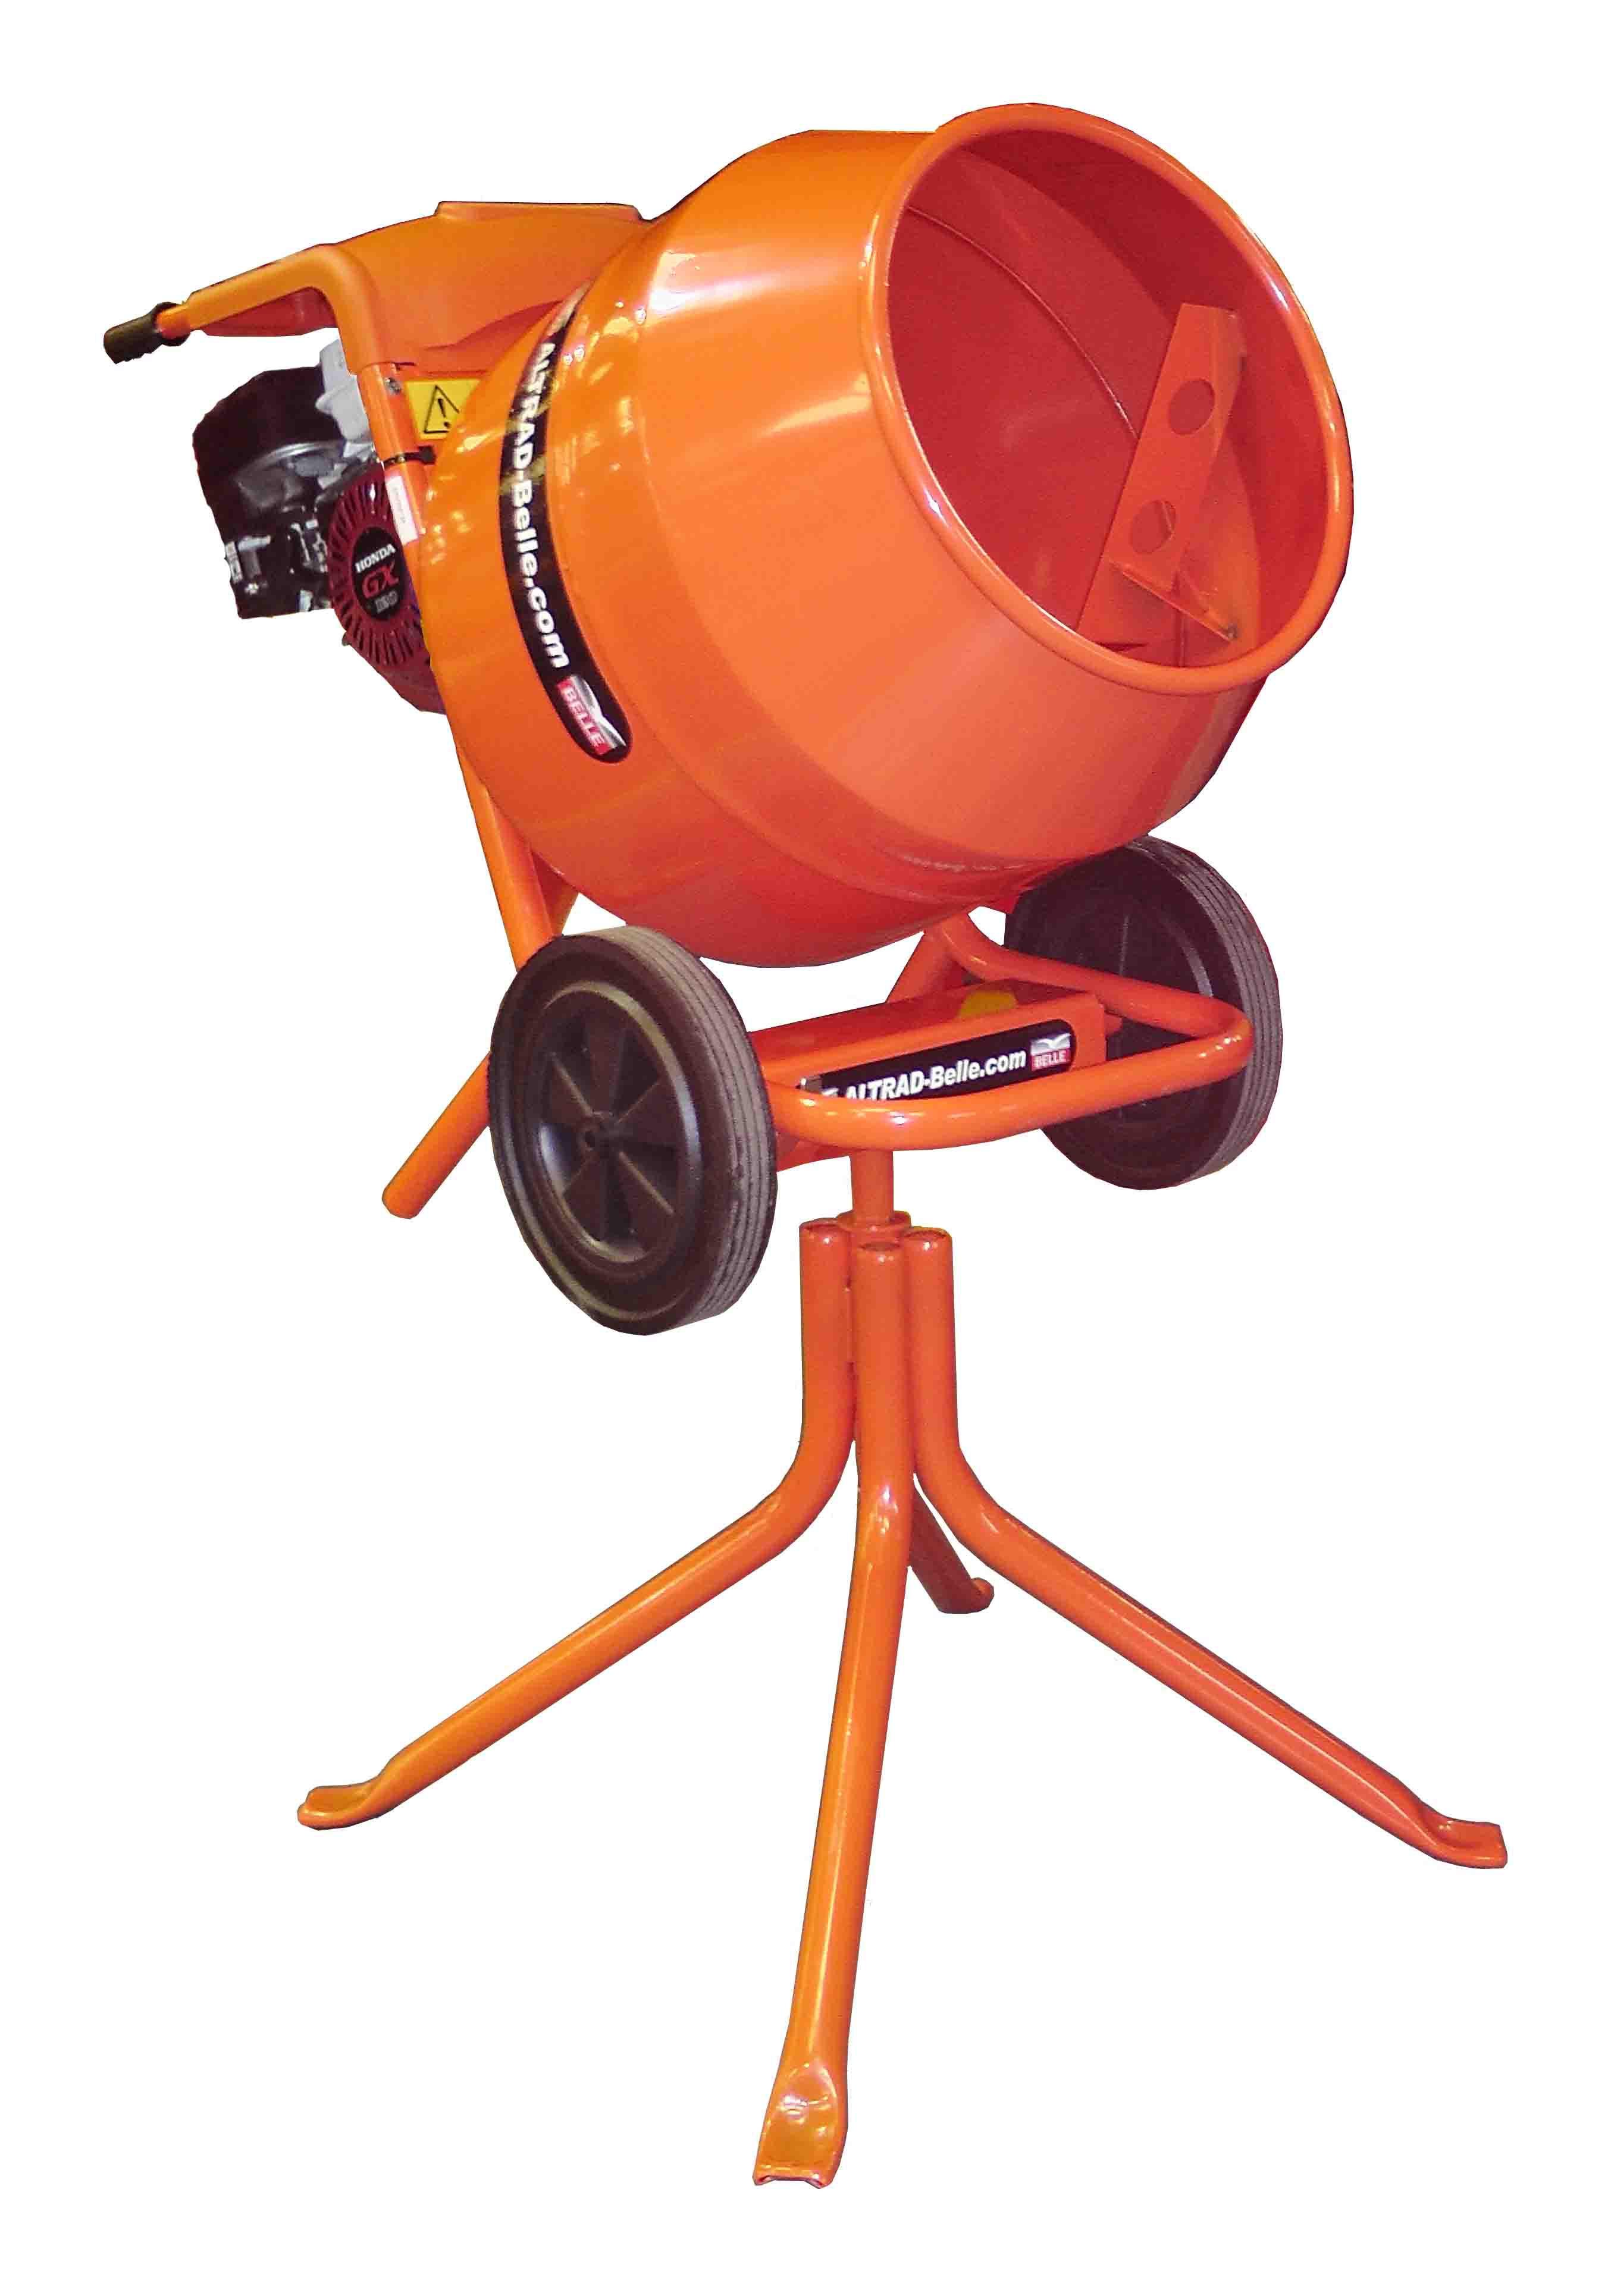 110v Electric Belle Cement Mixer 1/2 Bag (150Ltr)